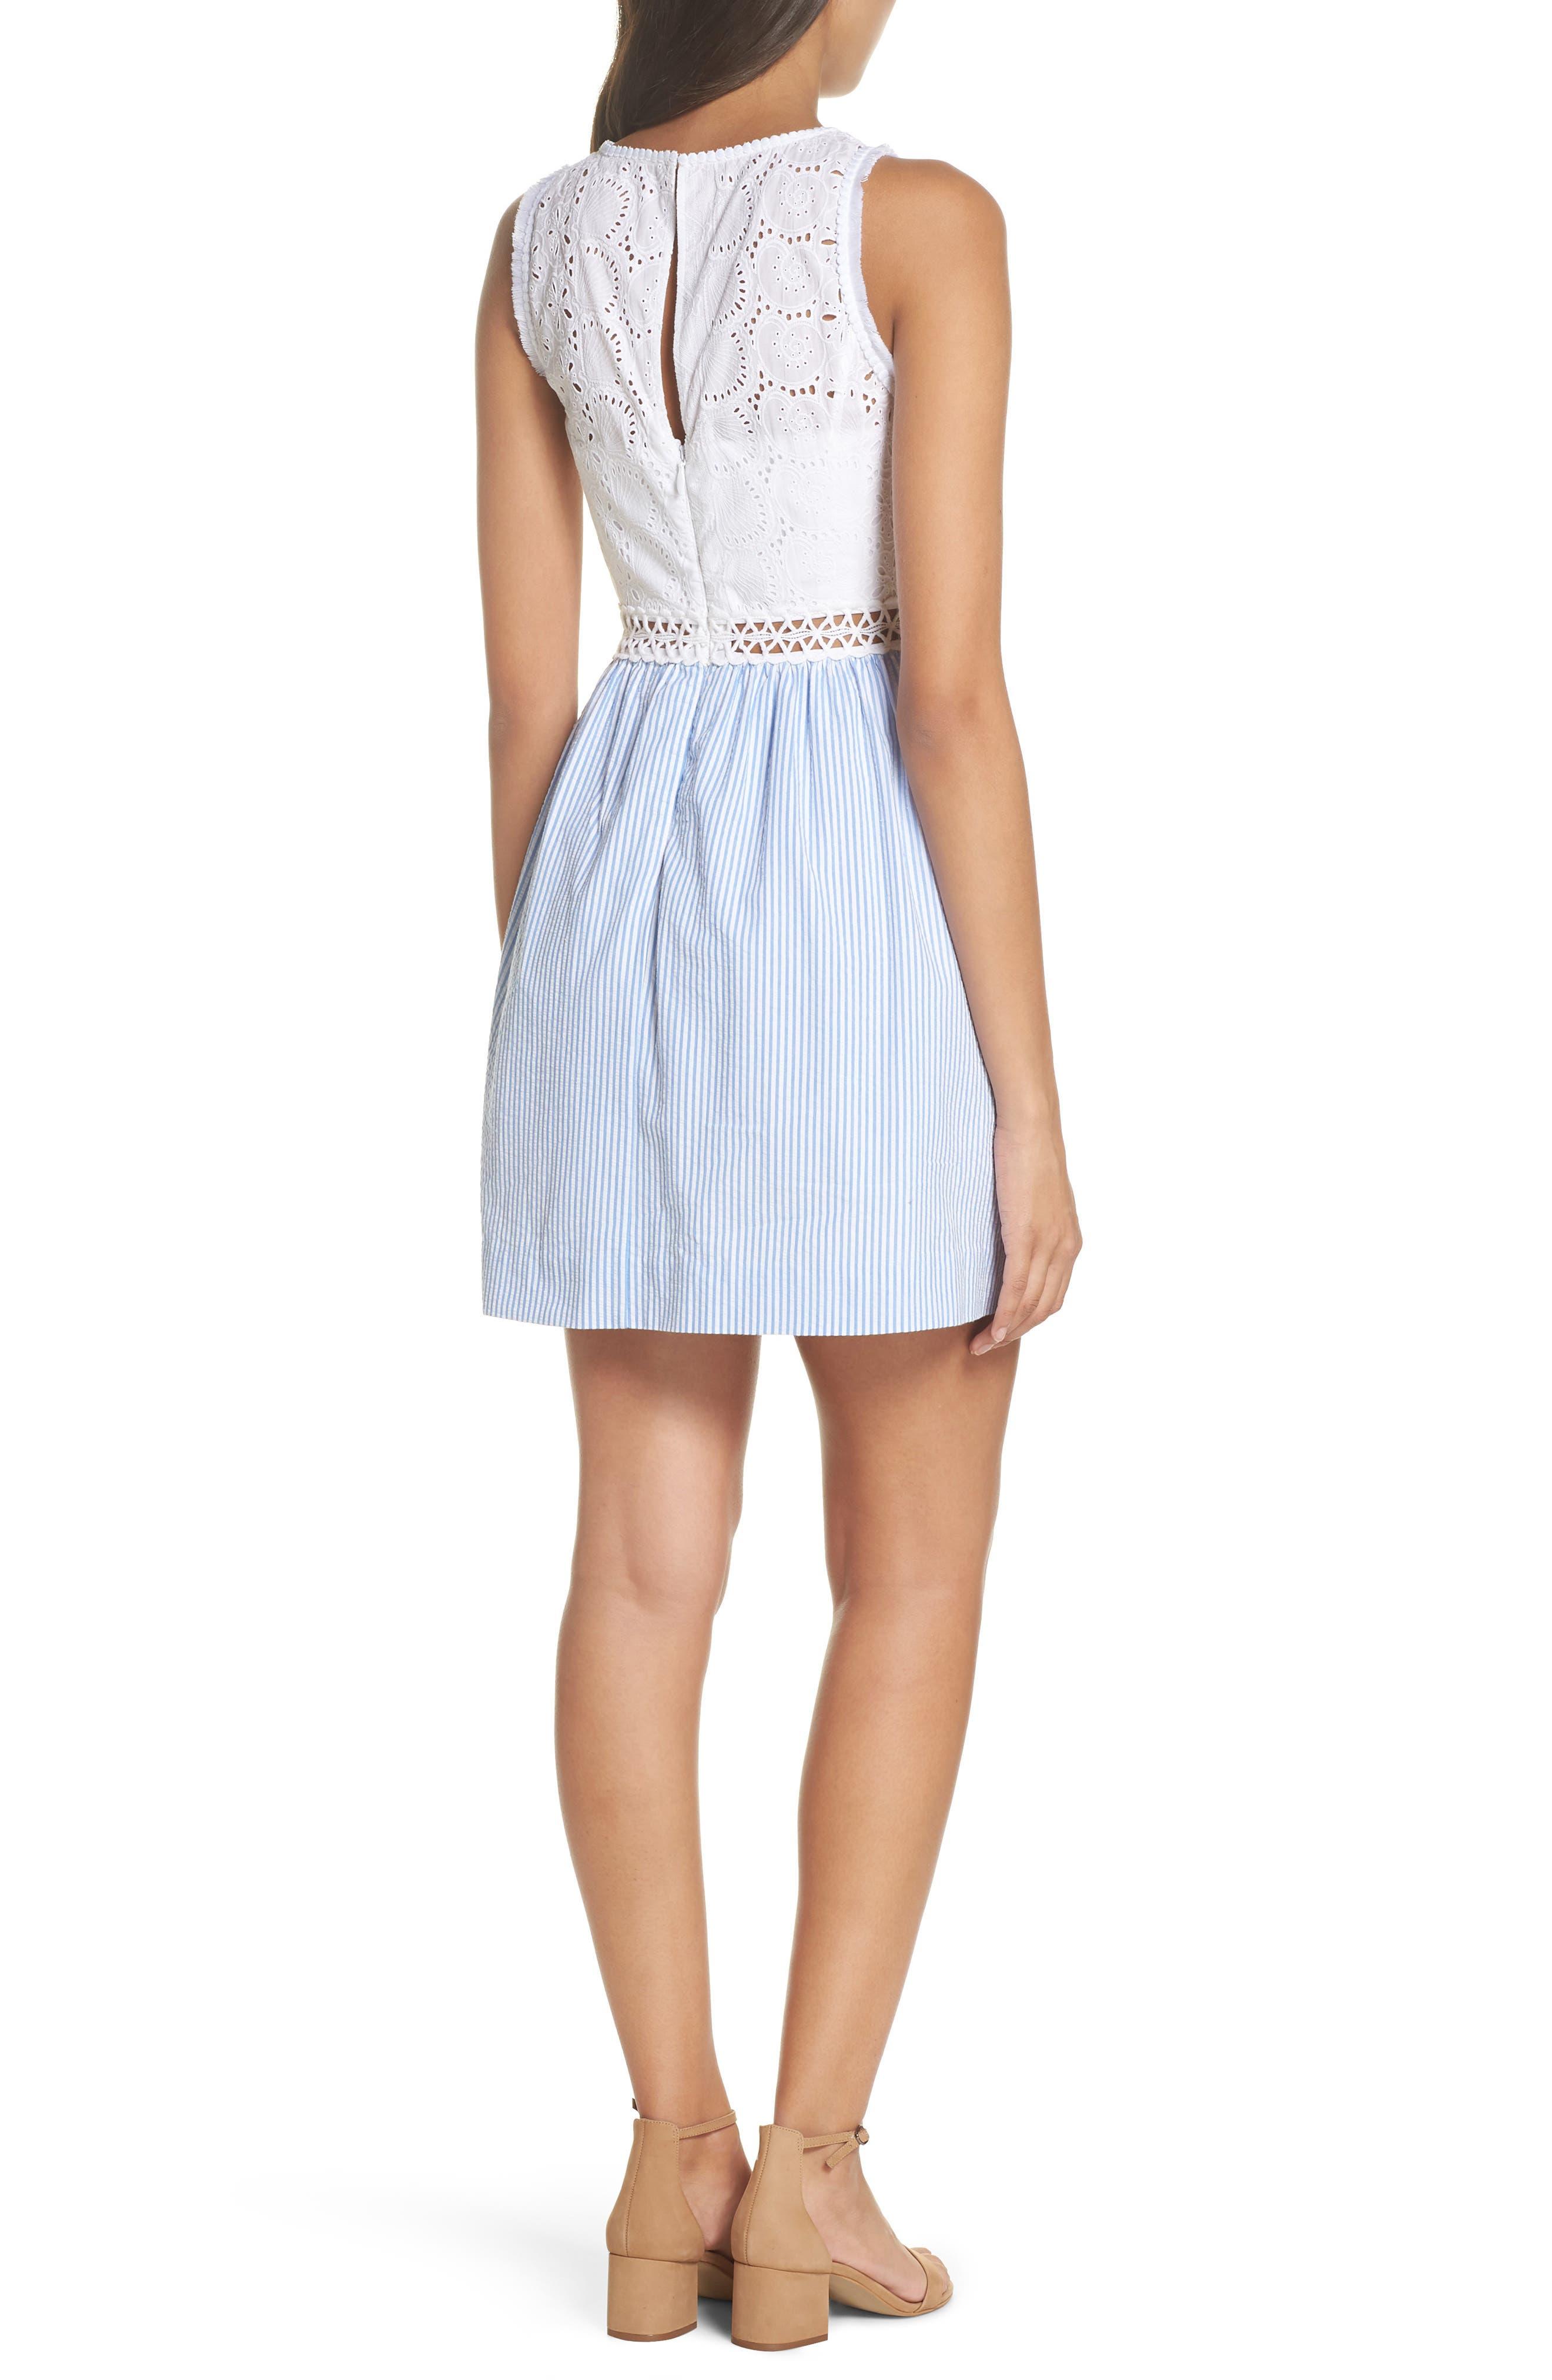 Lilly Pullitzer<sup>®</sup> Alivia Eyelet & Seersucker Fit & Flare Dress,                             Alternate thumbnail 2, color,                             Bennet Blue Yard Dyed Stripe